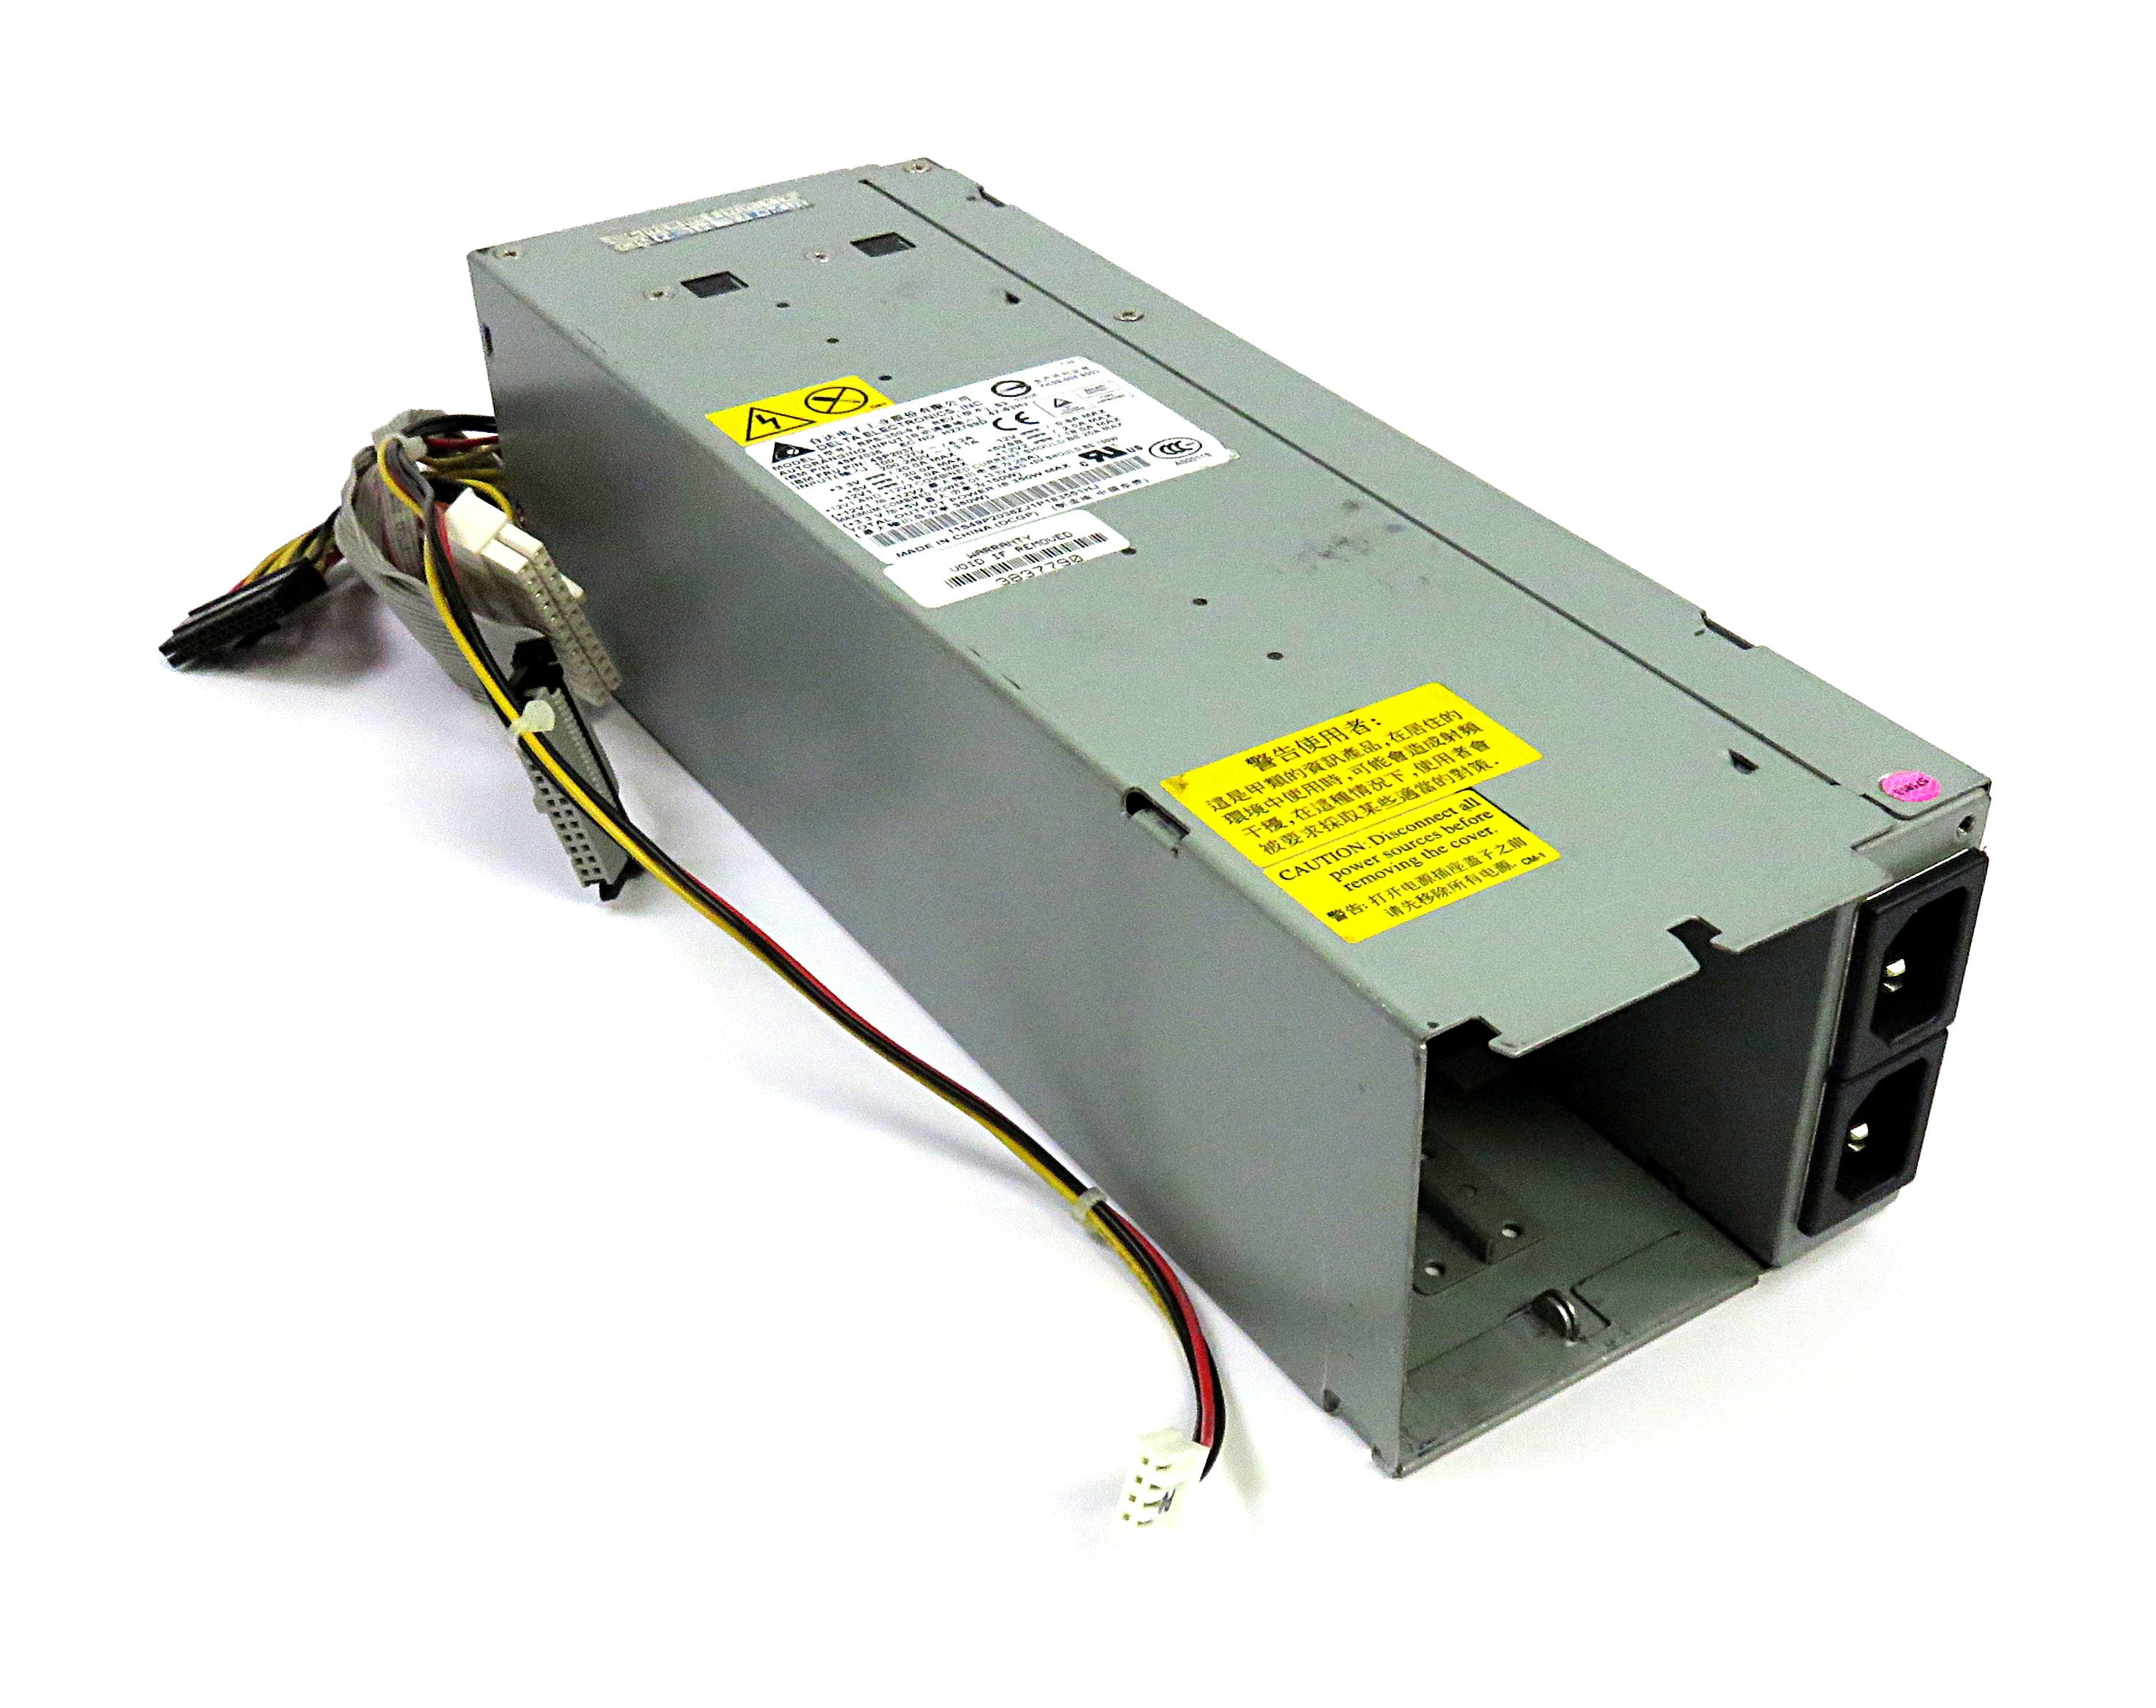 Ibm 49p2036 Dual Power Supply Cage 49p2037 F Xseries X345 Delta Rps 350